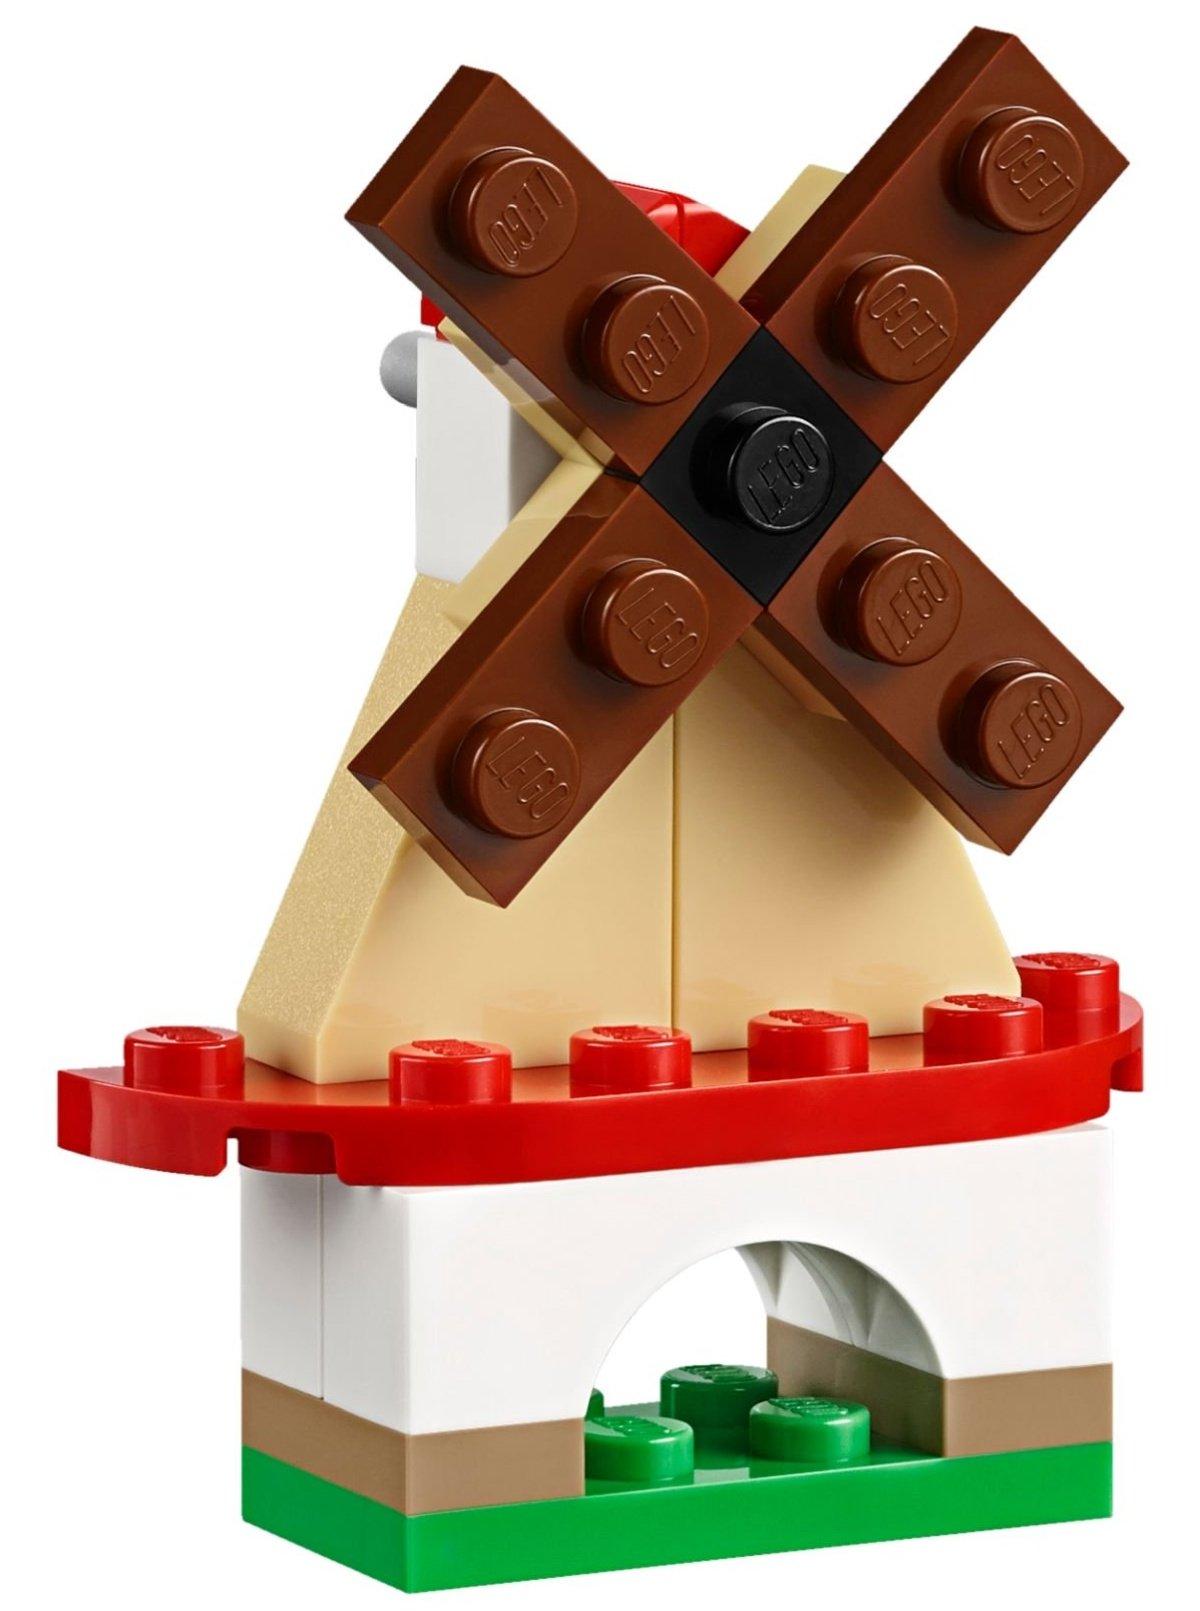 lego-classic-box-11009-2020-0007